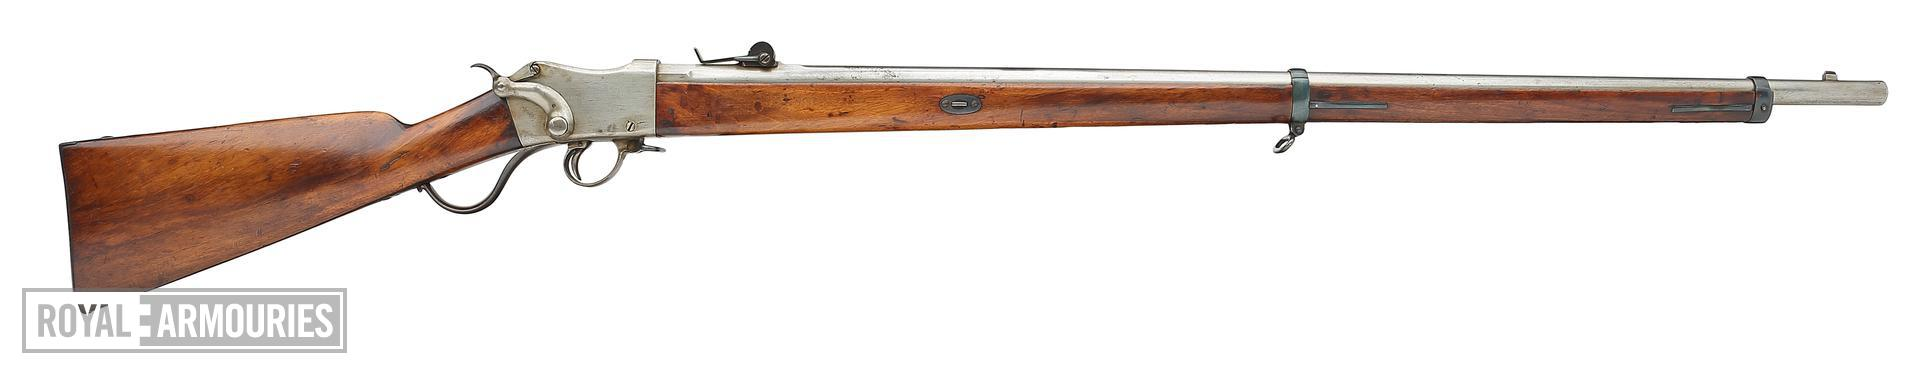 Rimfire breech-loading rifle - Experimental Martini